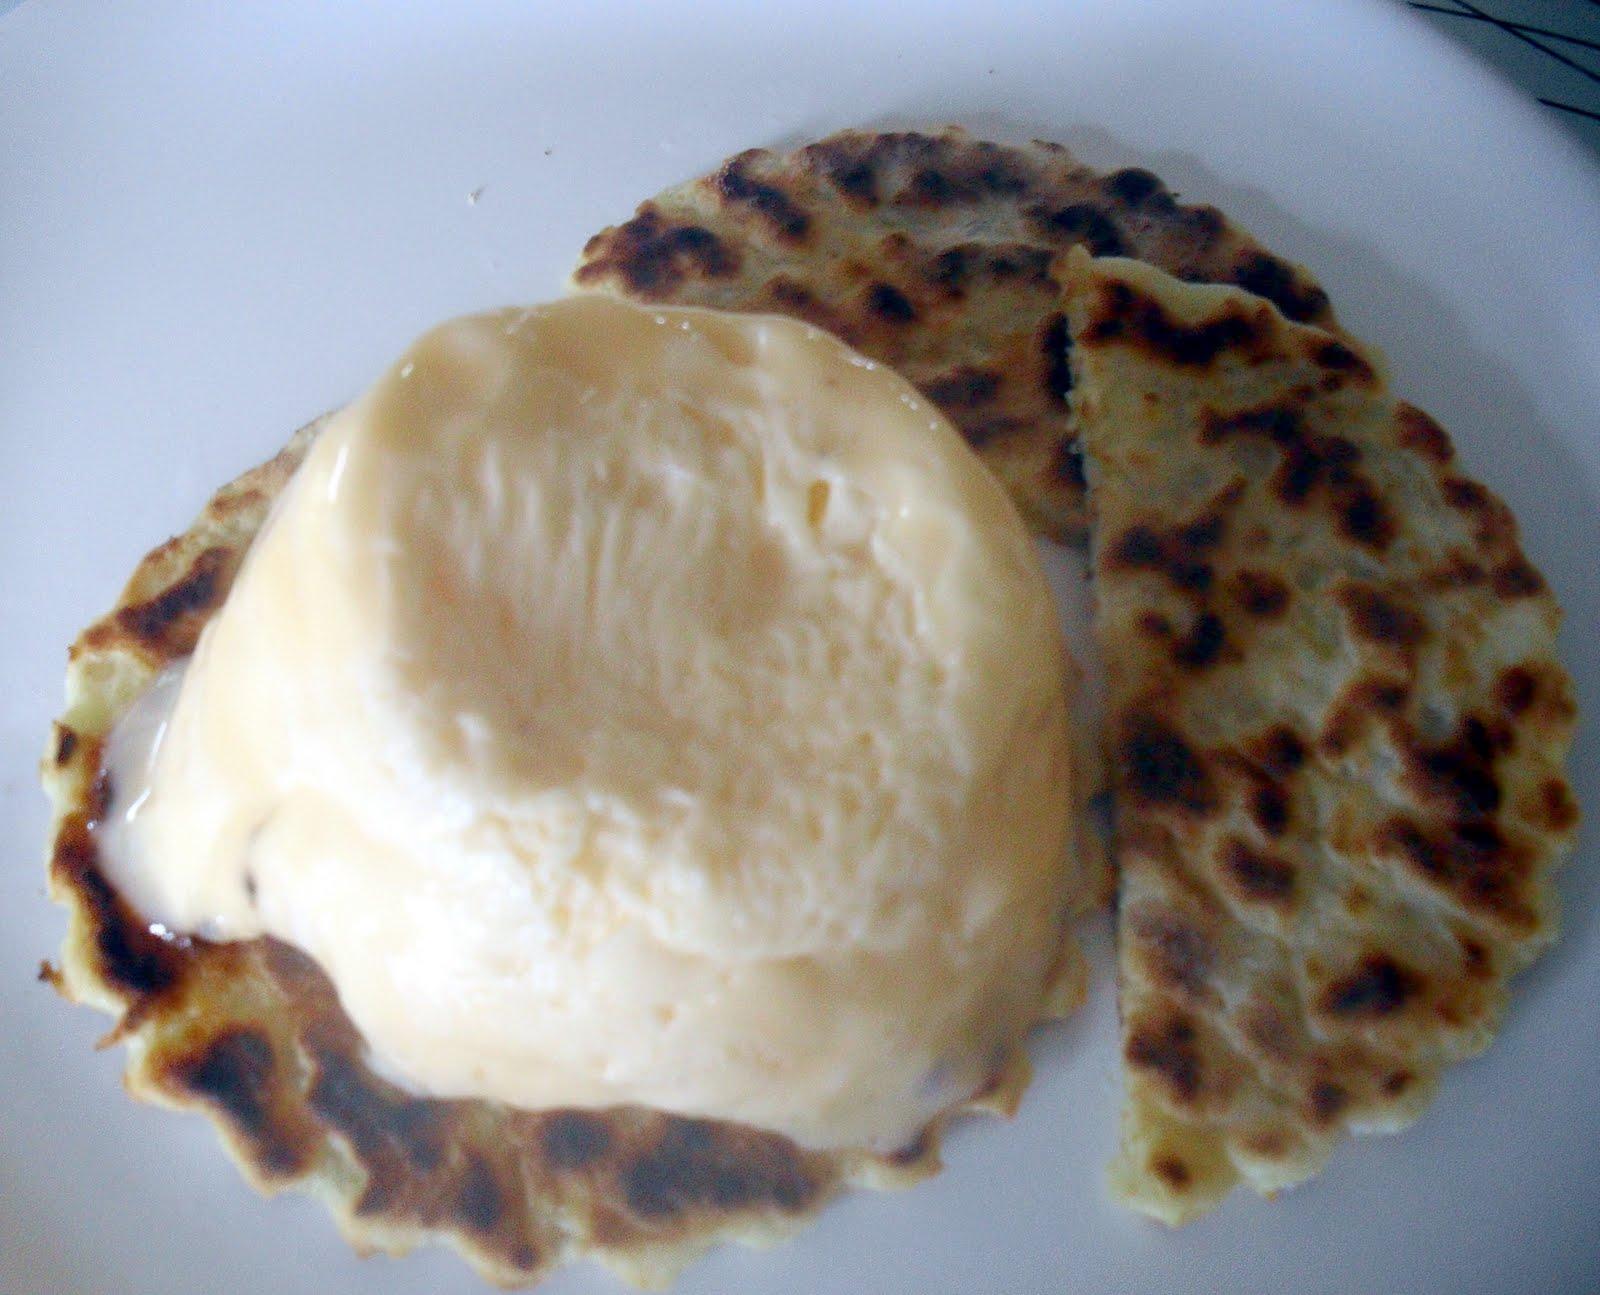 unadorned scrambled egg with potato scones